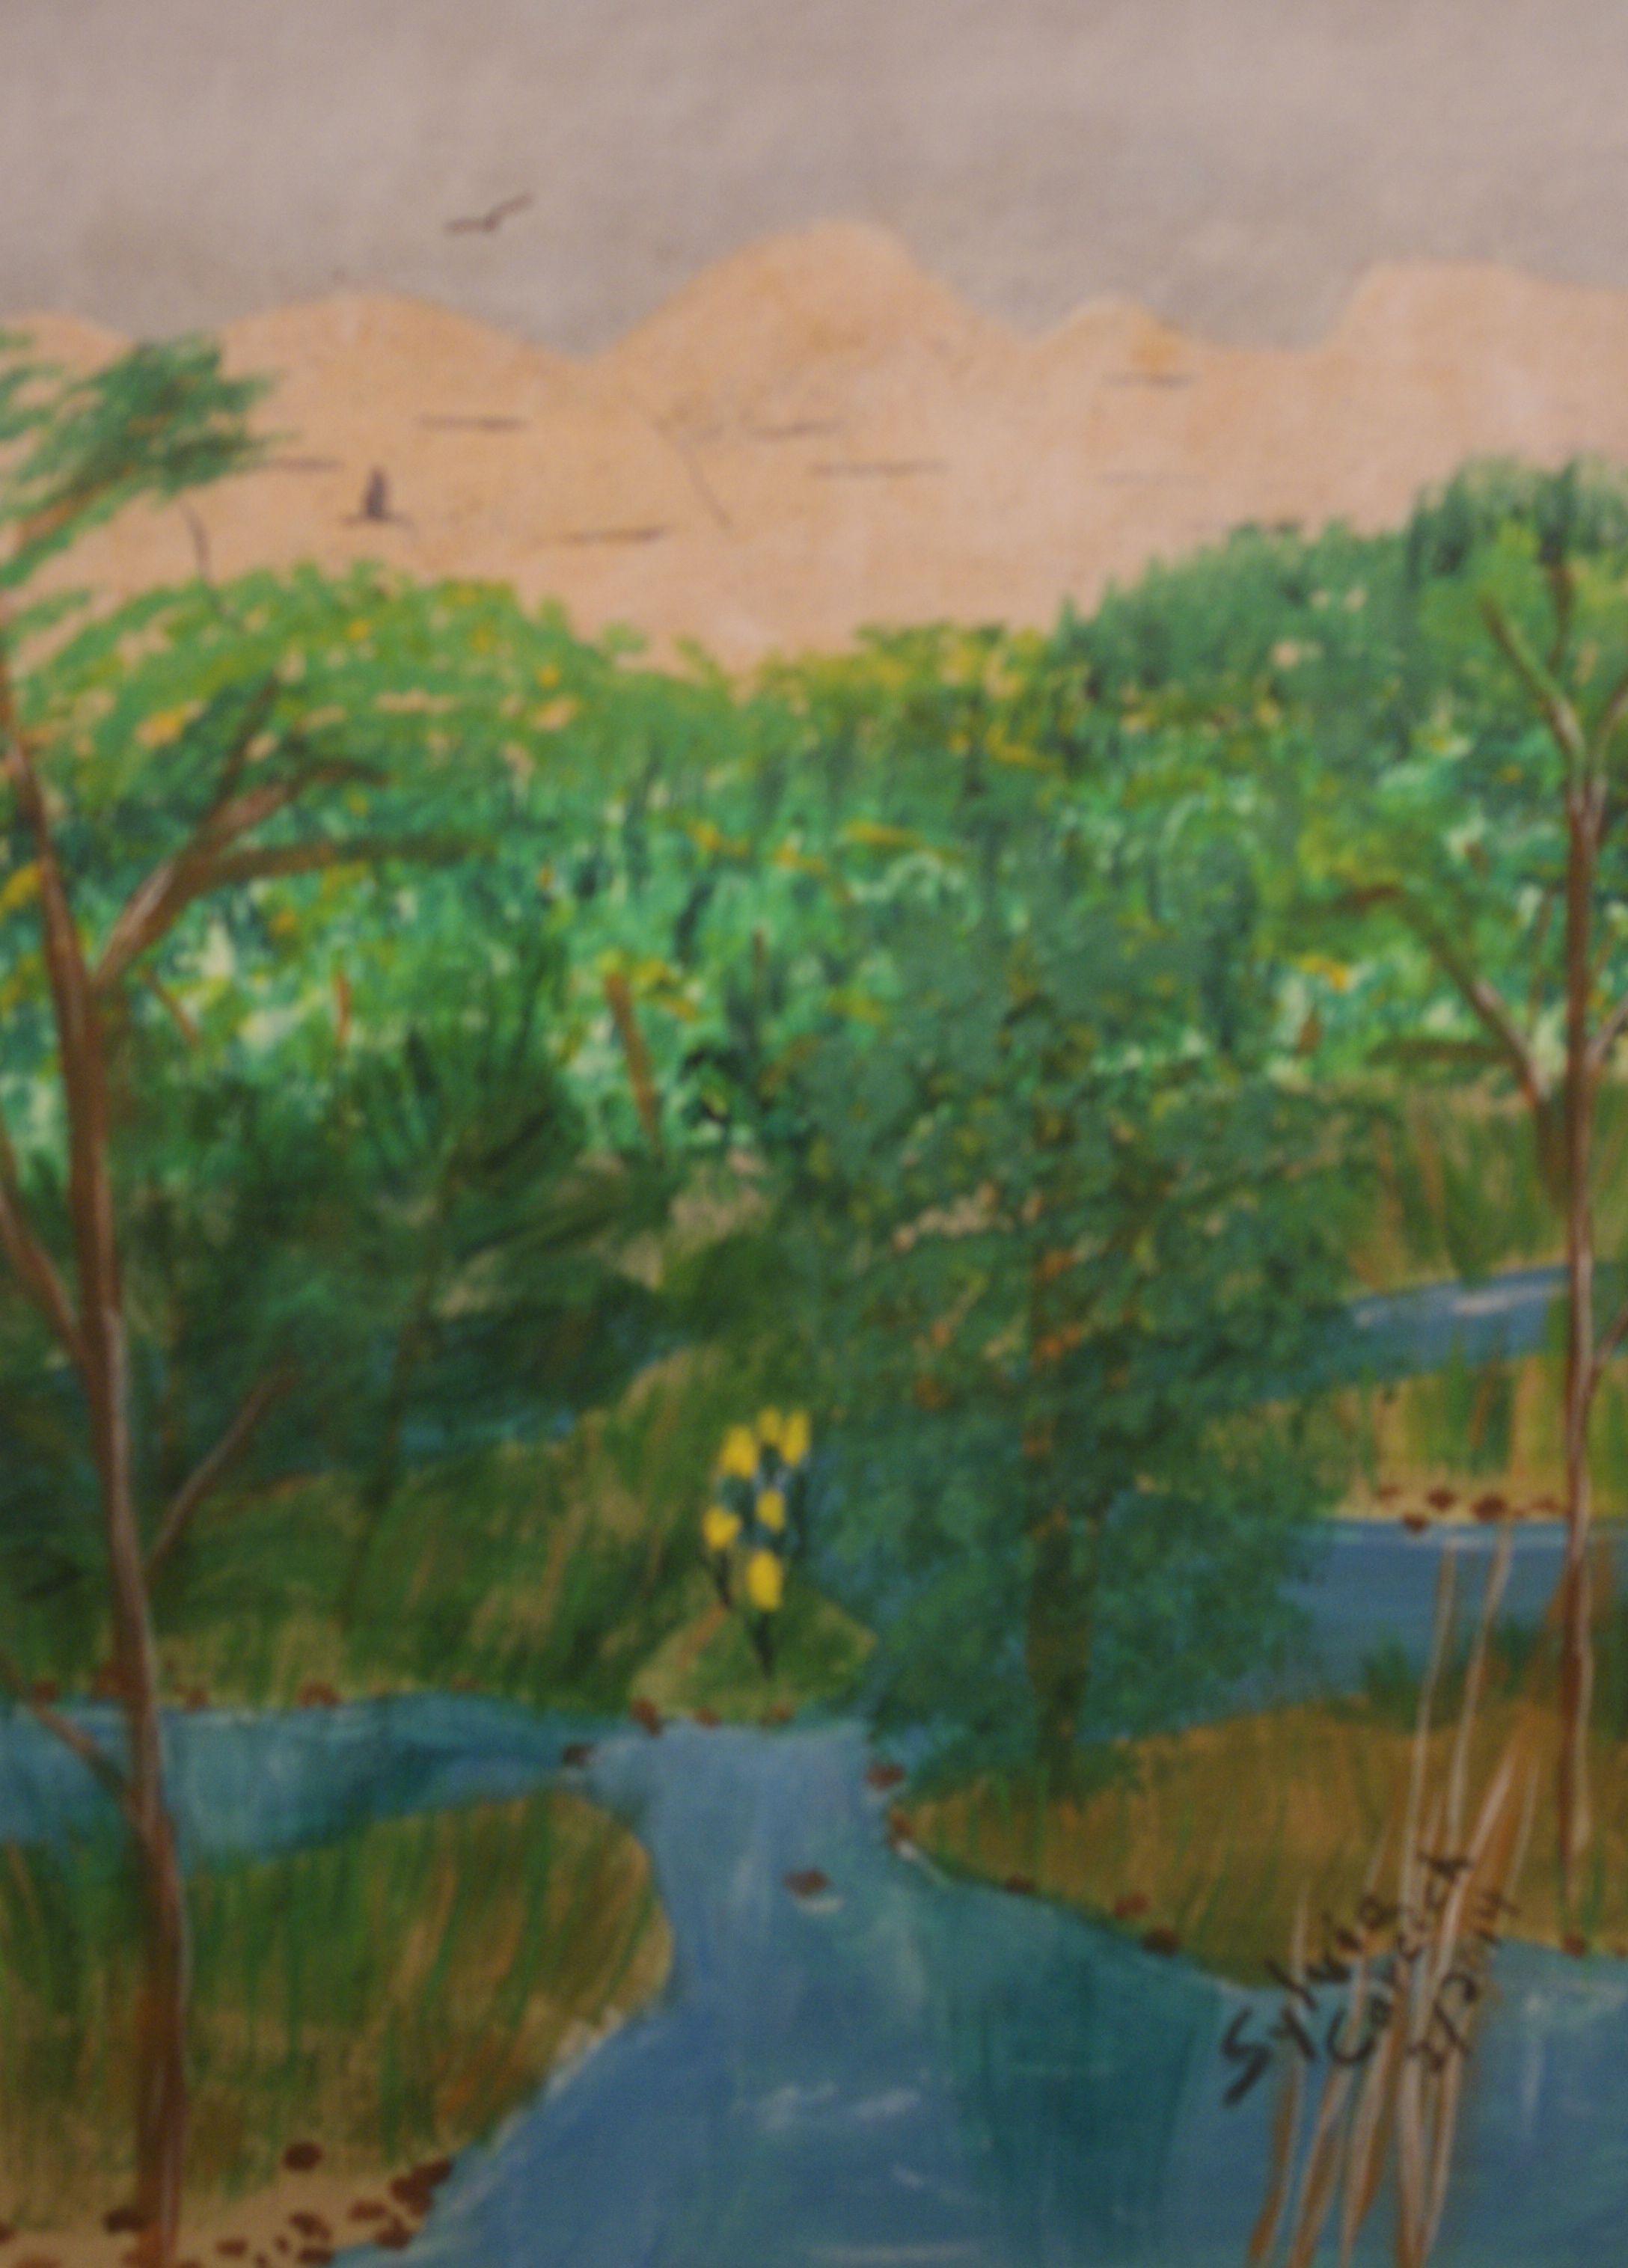 Winding Creek 11X14 acrylic on canvas $150.00 +shipping